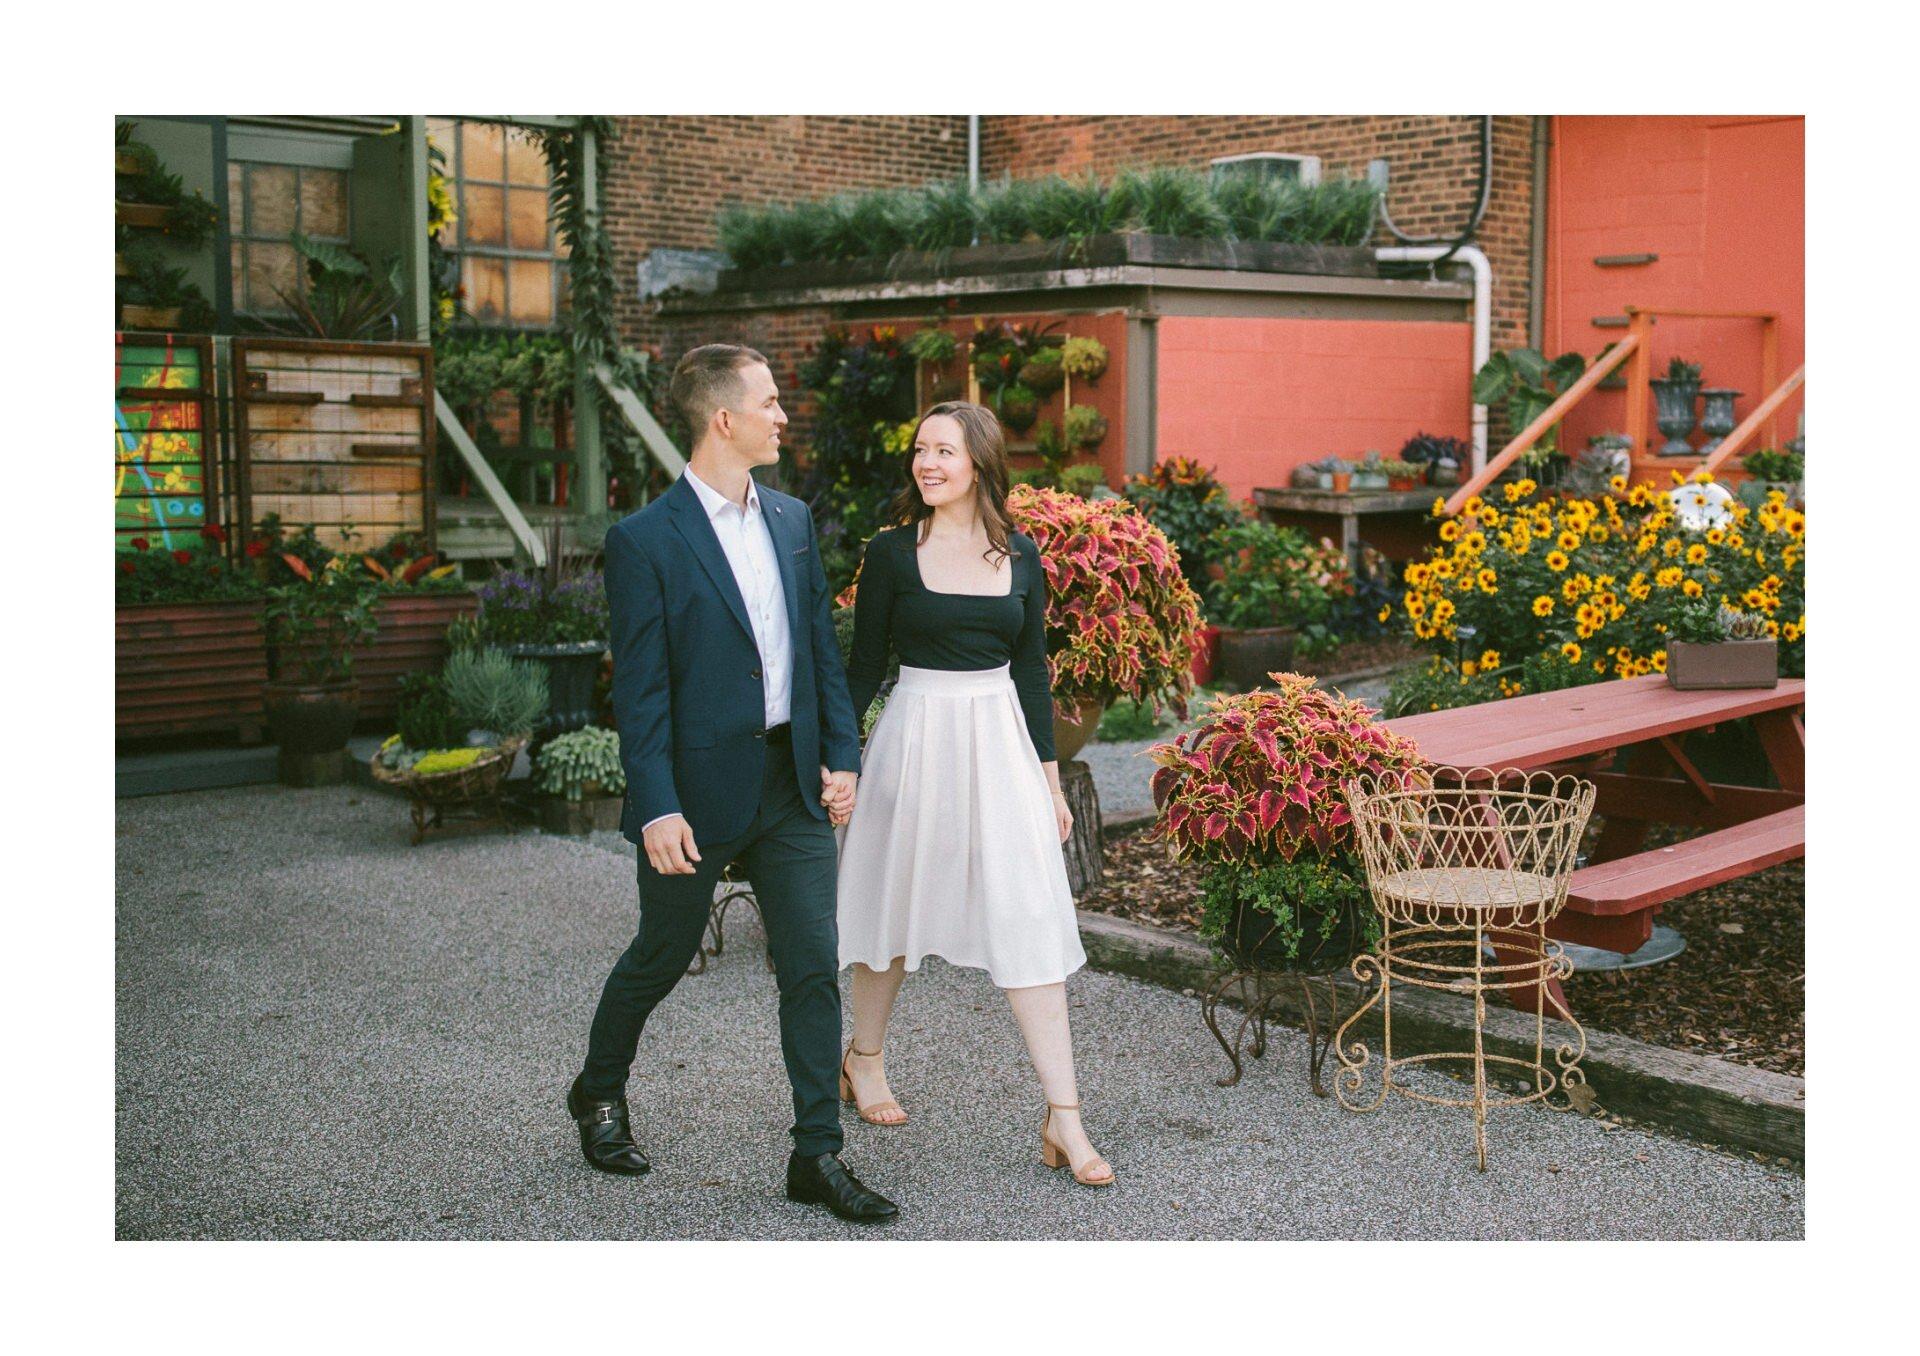 78th Street Studio Engagement and Wedding Photographer 14.jpg